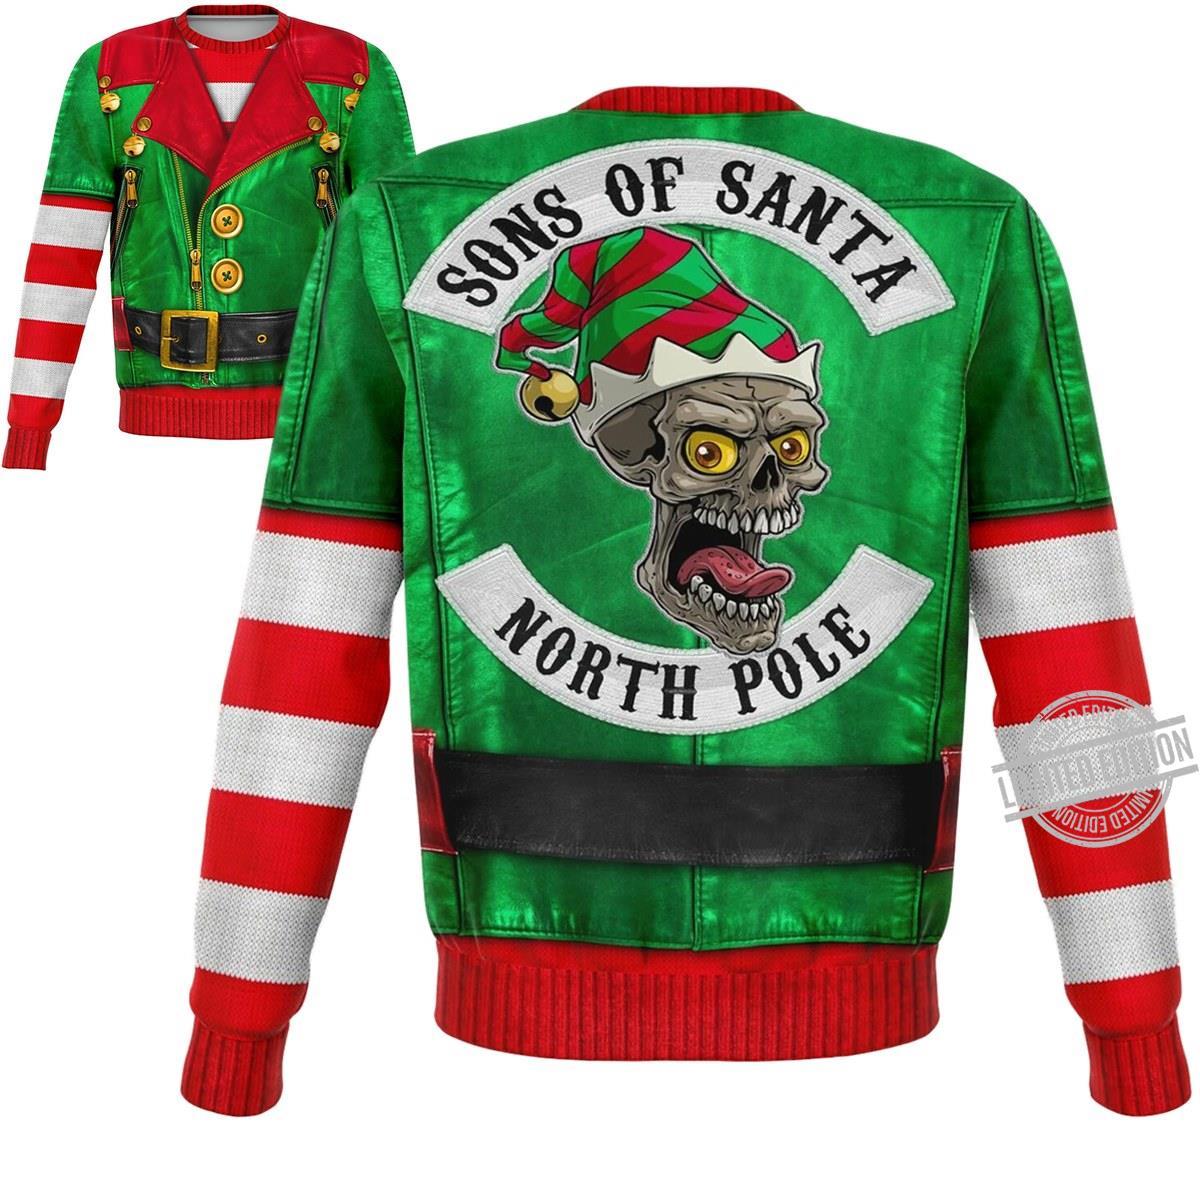 Sons Of Danta North Pole Sweatshirt